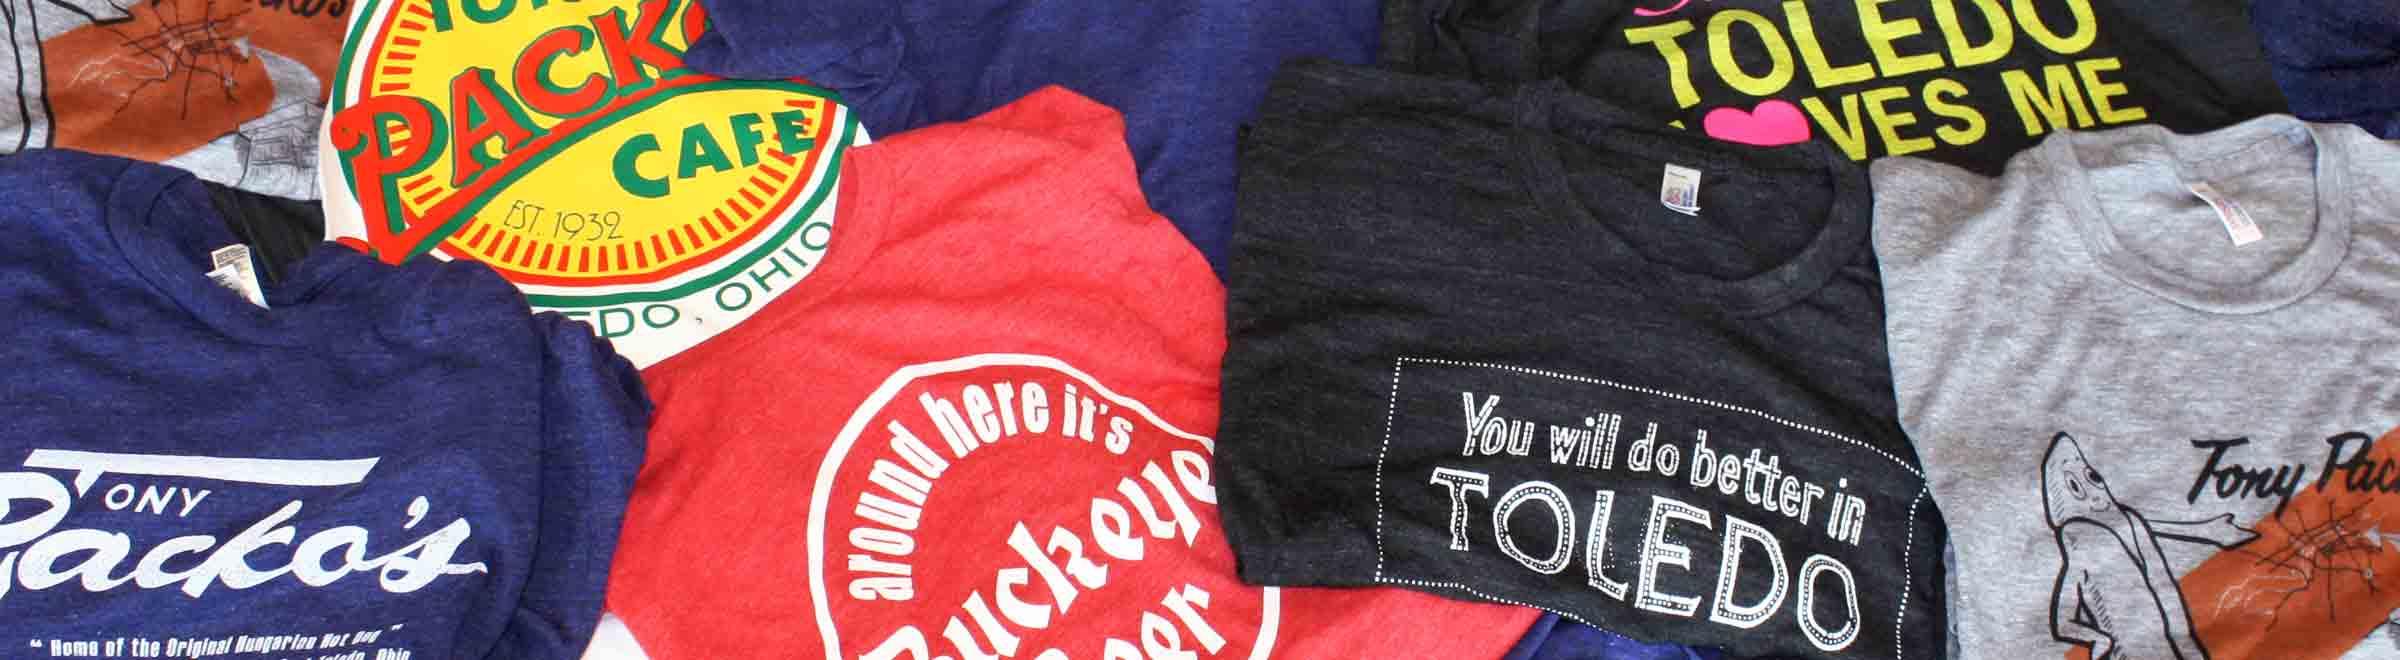 Packo toledo shirts tony packo 39 s for You will do better in toledo shirt